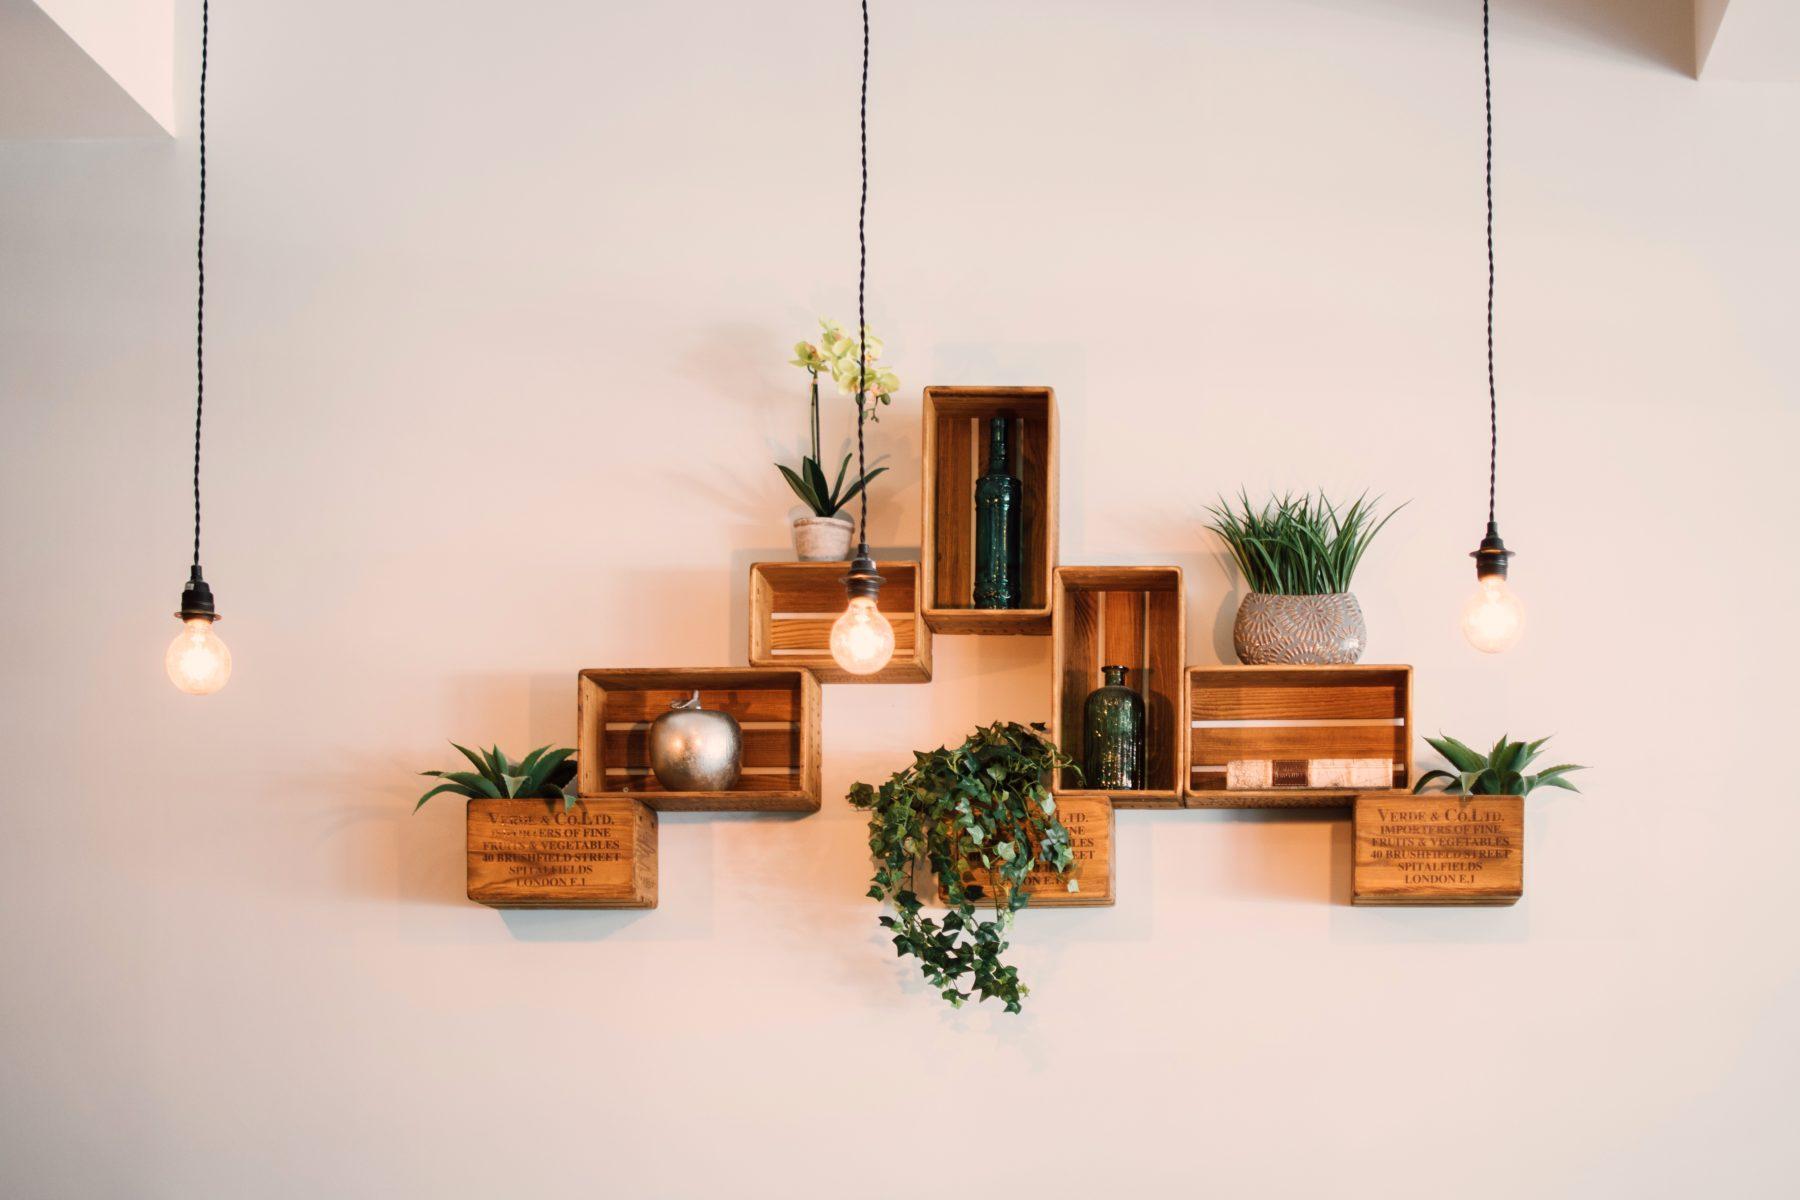 Brightening up apartments with lighting | Vita Locators tips